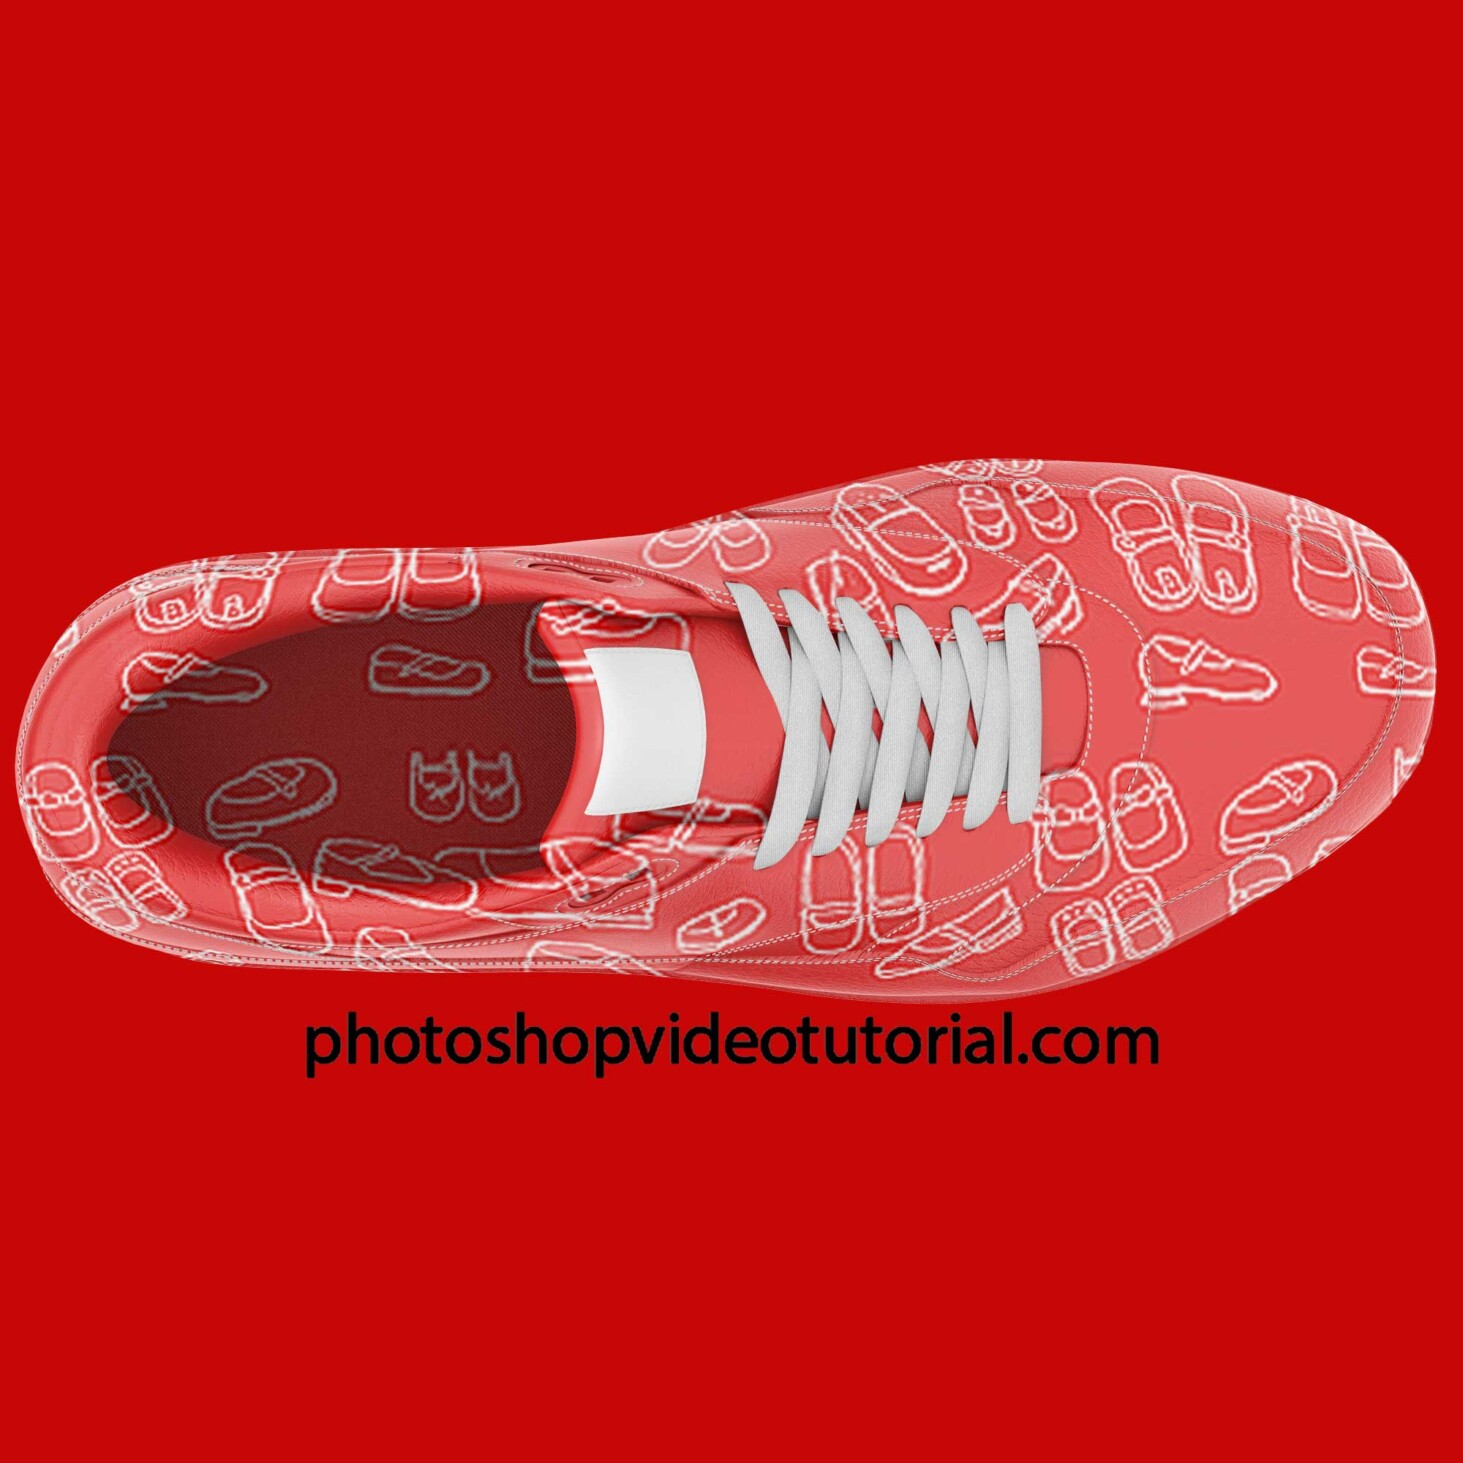 Free Shoes Mockup